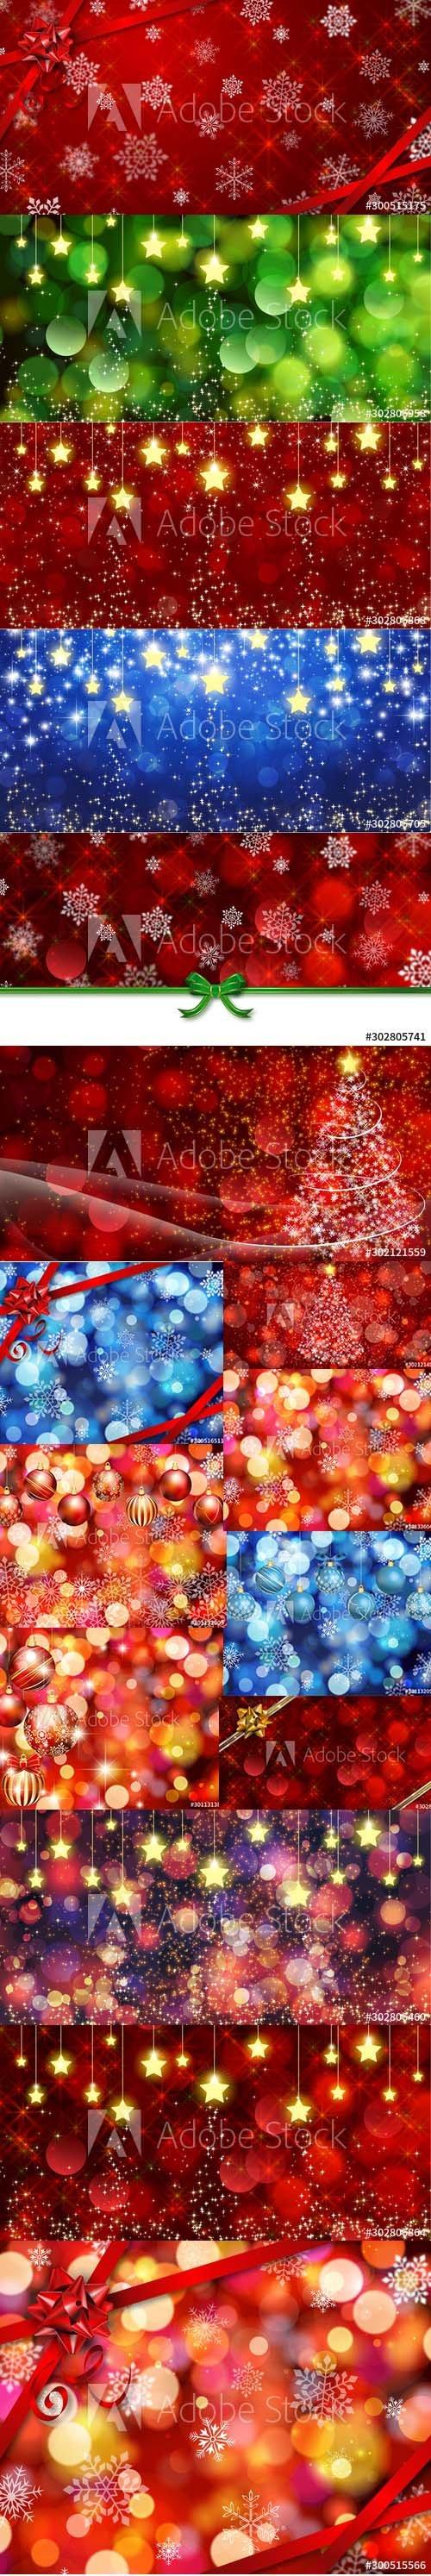 Magic Christmas Backgrounds Set Vol 3